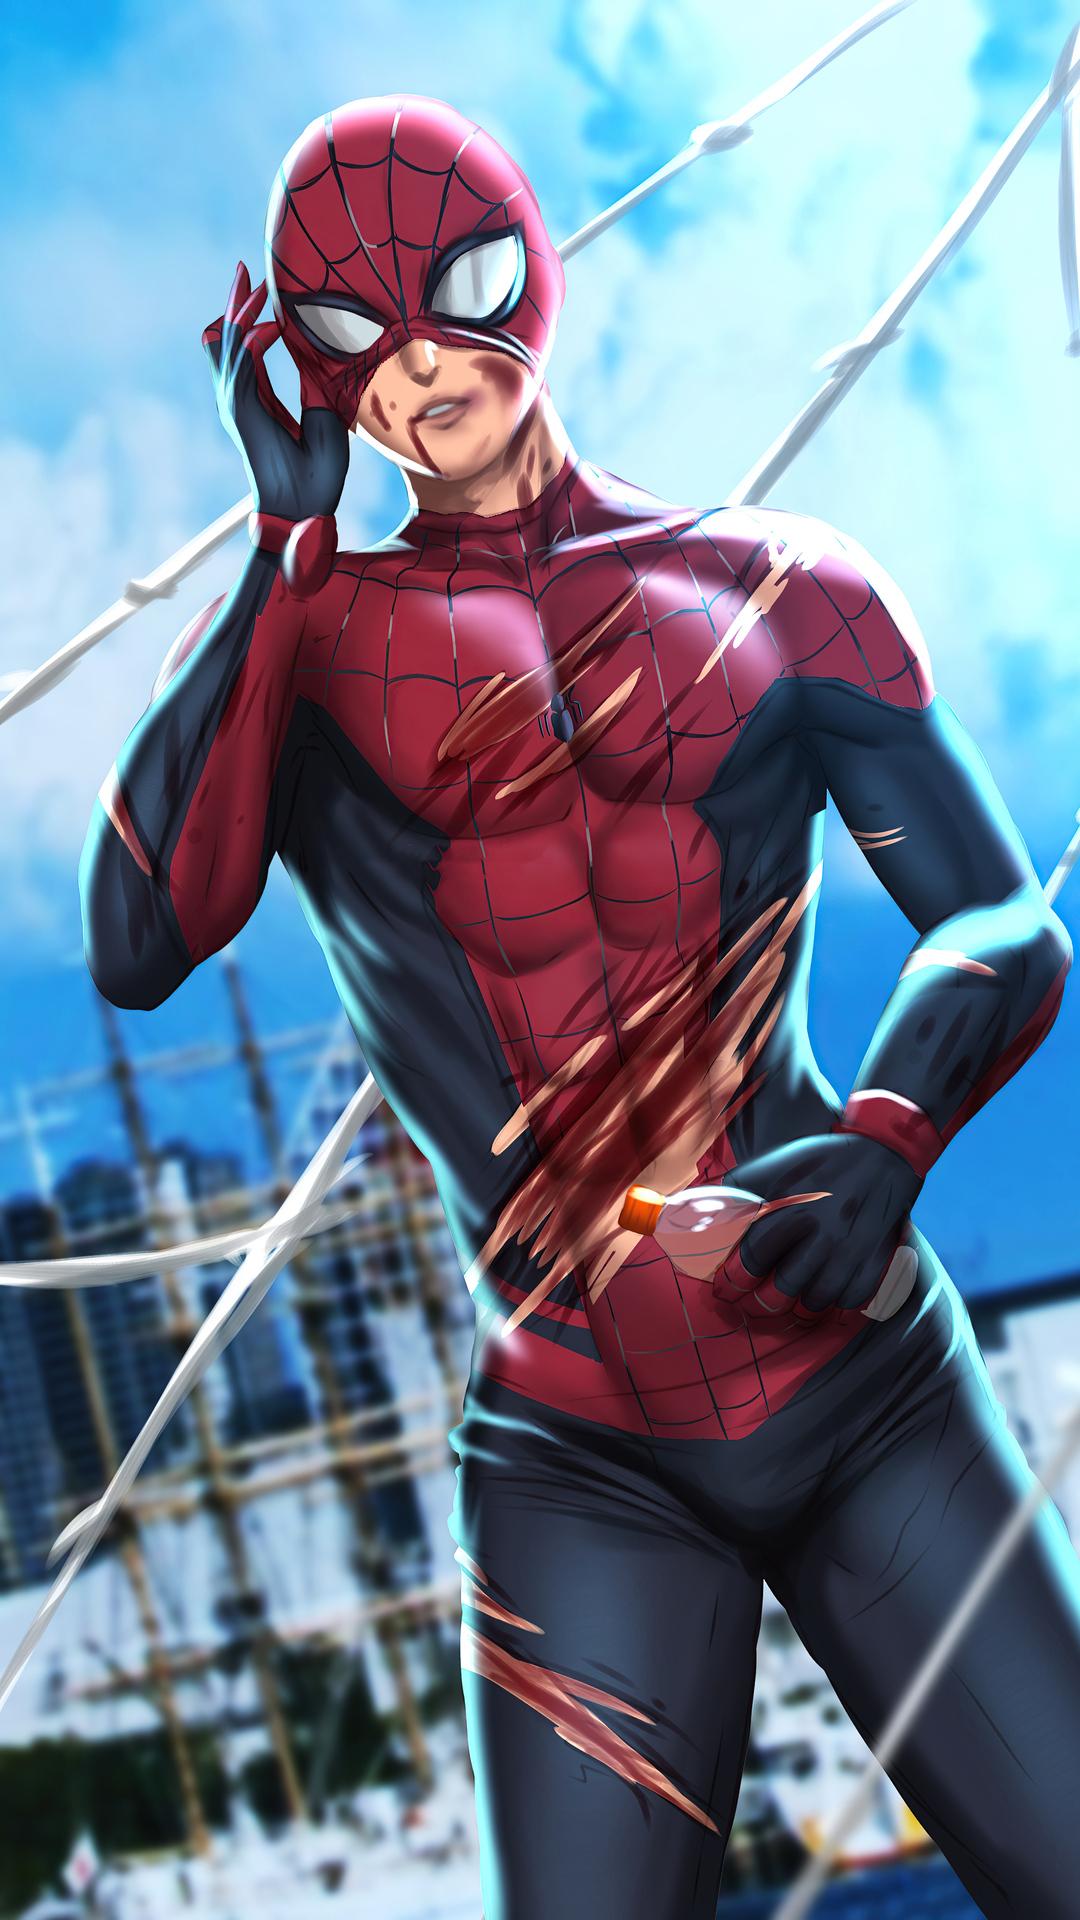 1080x1920 Spider Man 2020 4k Artwork Iphone 7,6s,6 Plus ...